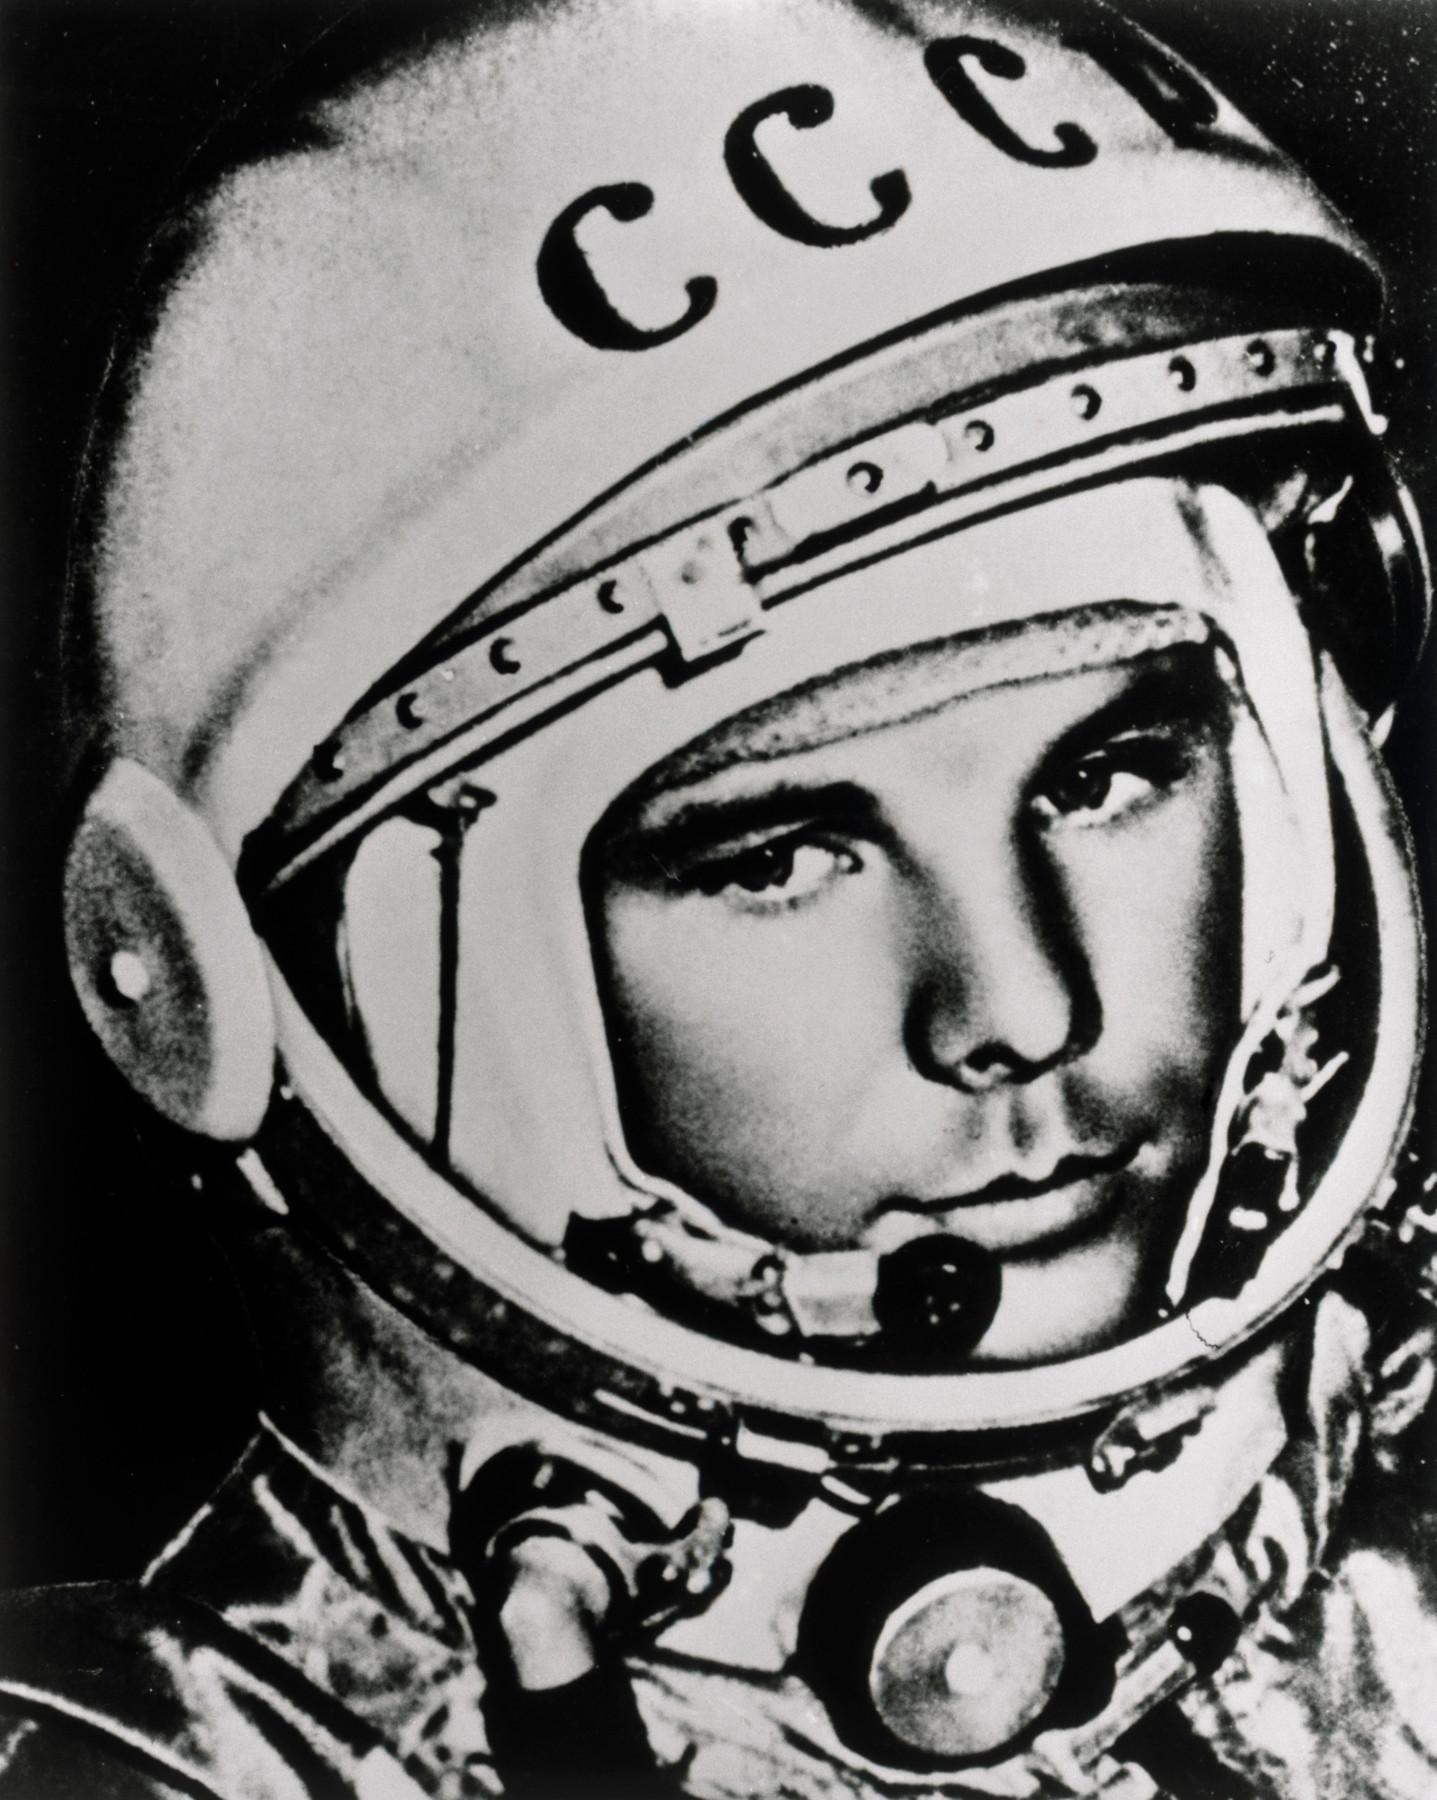 Bild 2 Sturmanskie Gagarin 2609-3714129 Vintage Retro Titan Automatikuhr